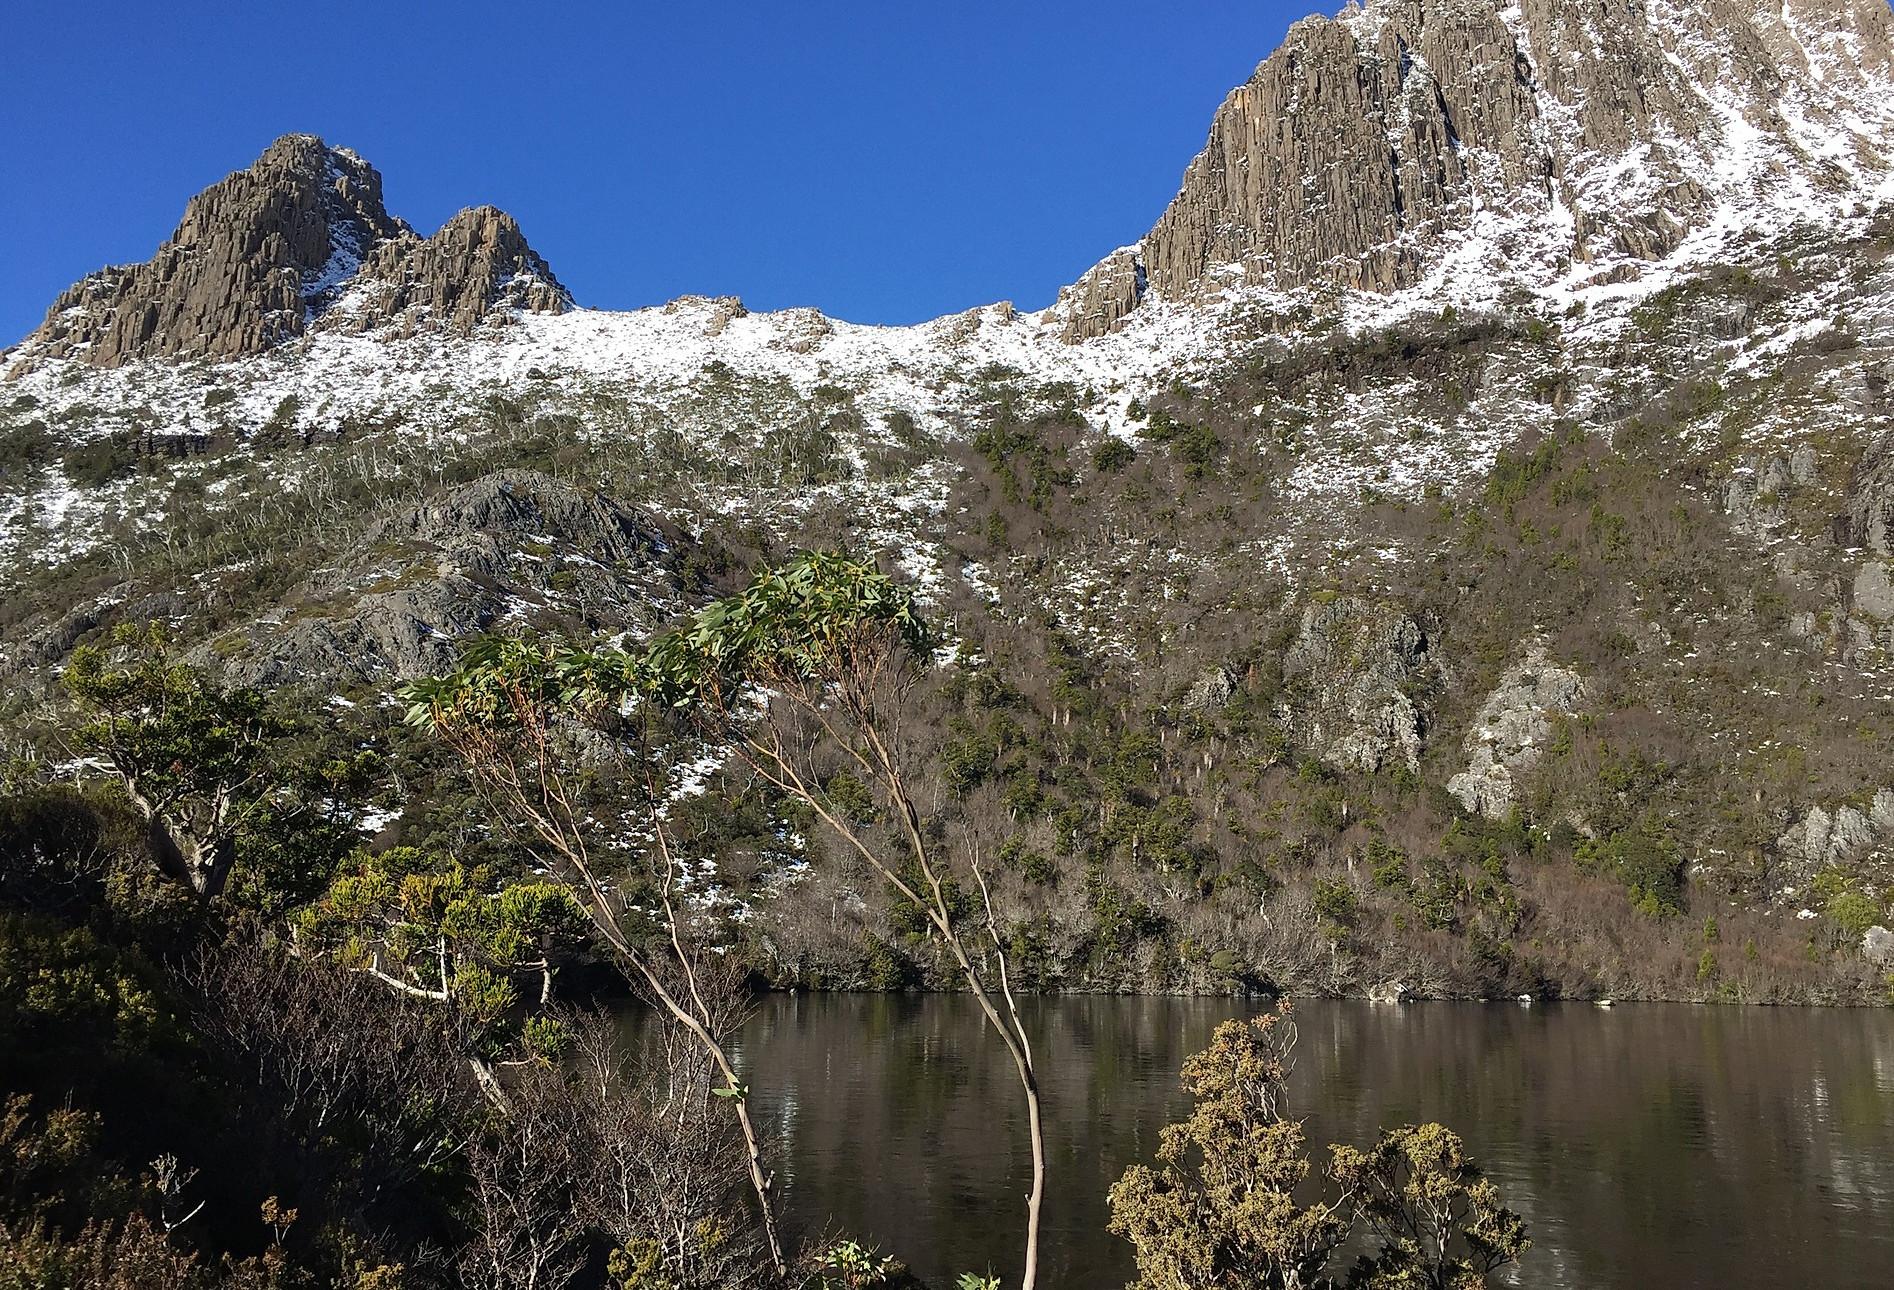 Озеро Вилкс (Lake Wilks) — Тасмания 2018 — Блог о путешествиях Сергея Чеботова